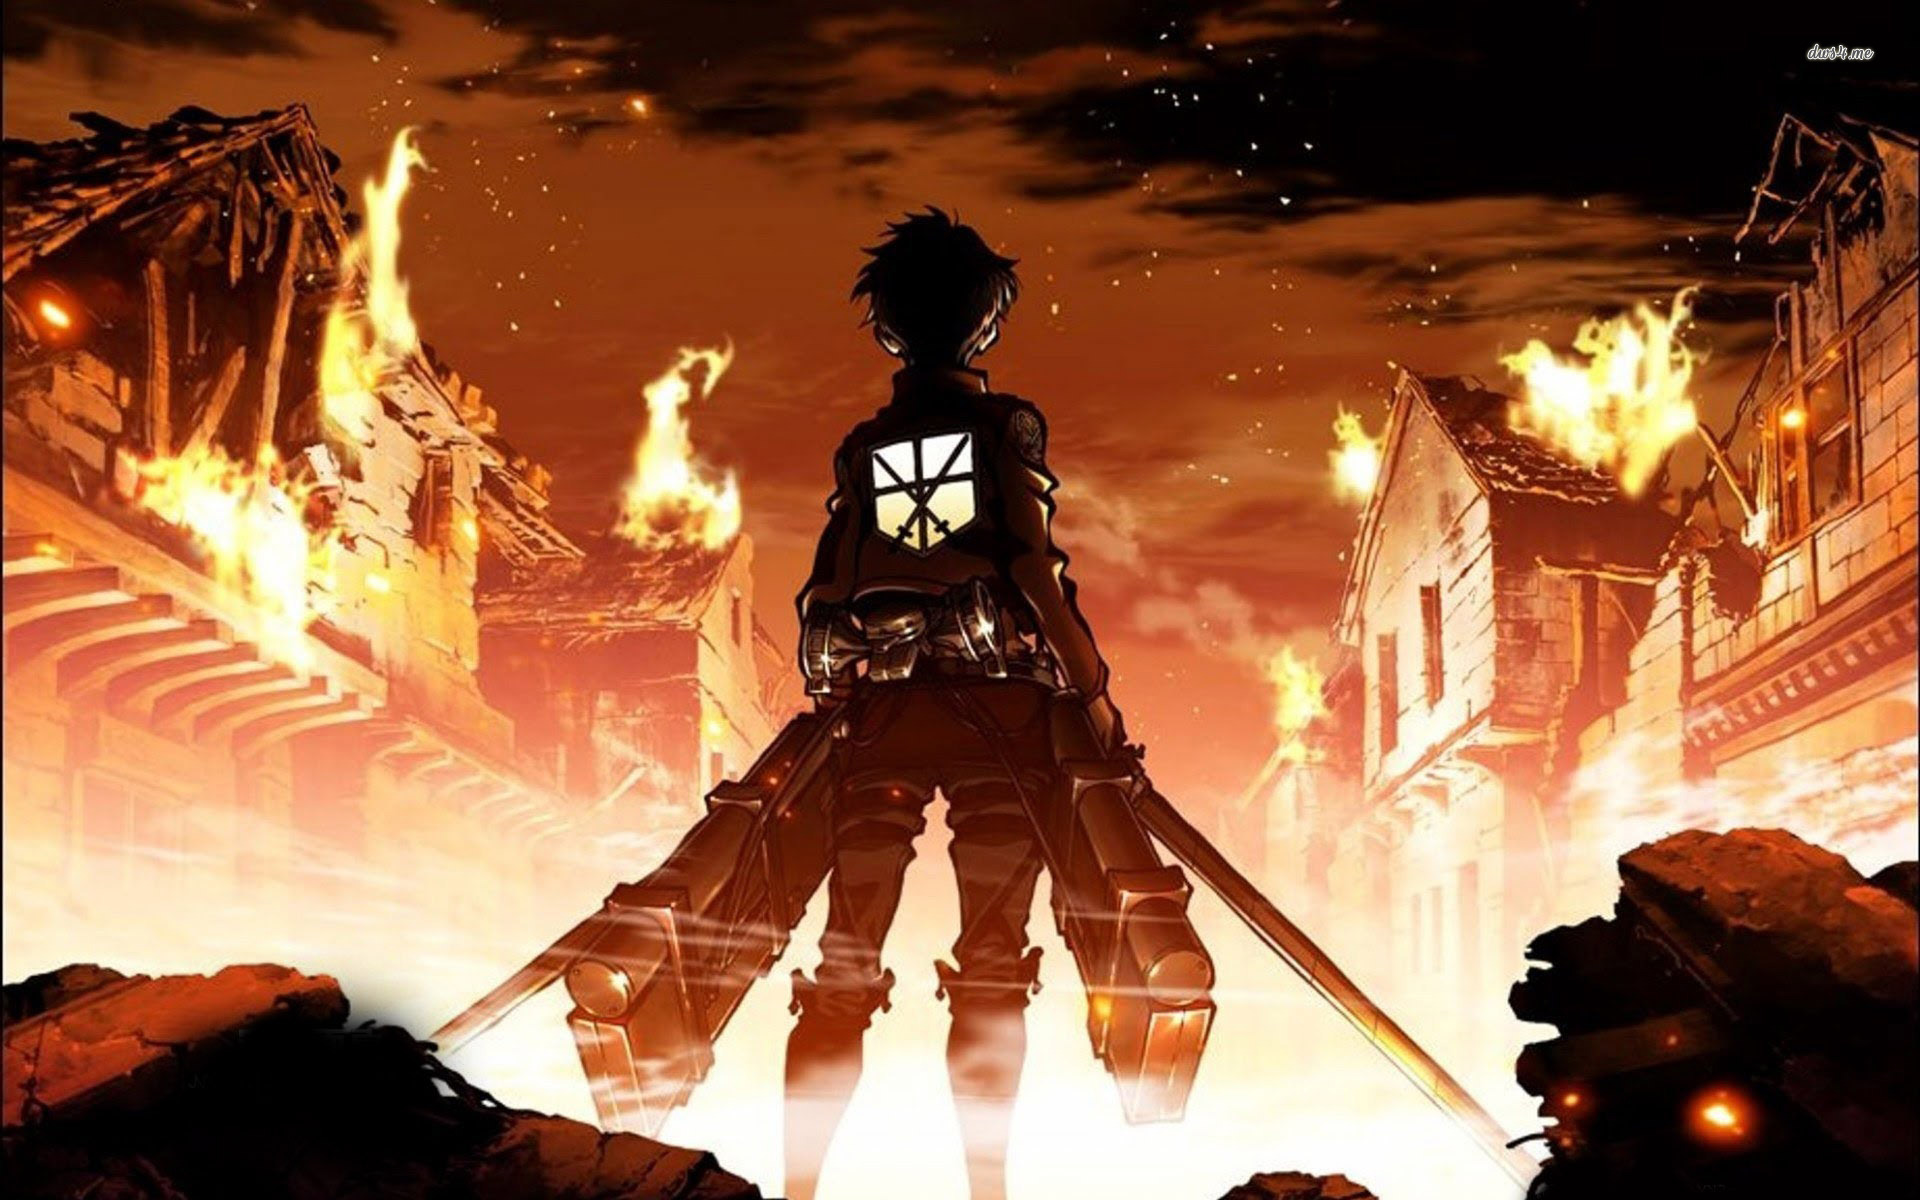 508247 - Un género, un anime - Hablemos de Anime y Manga